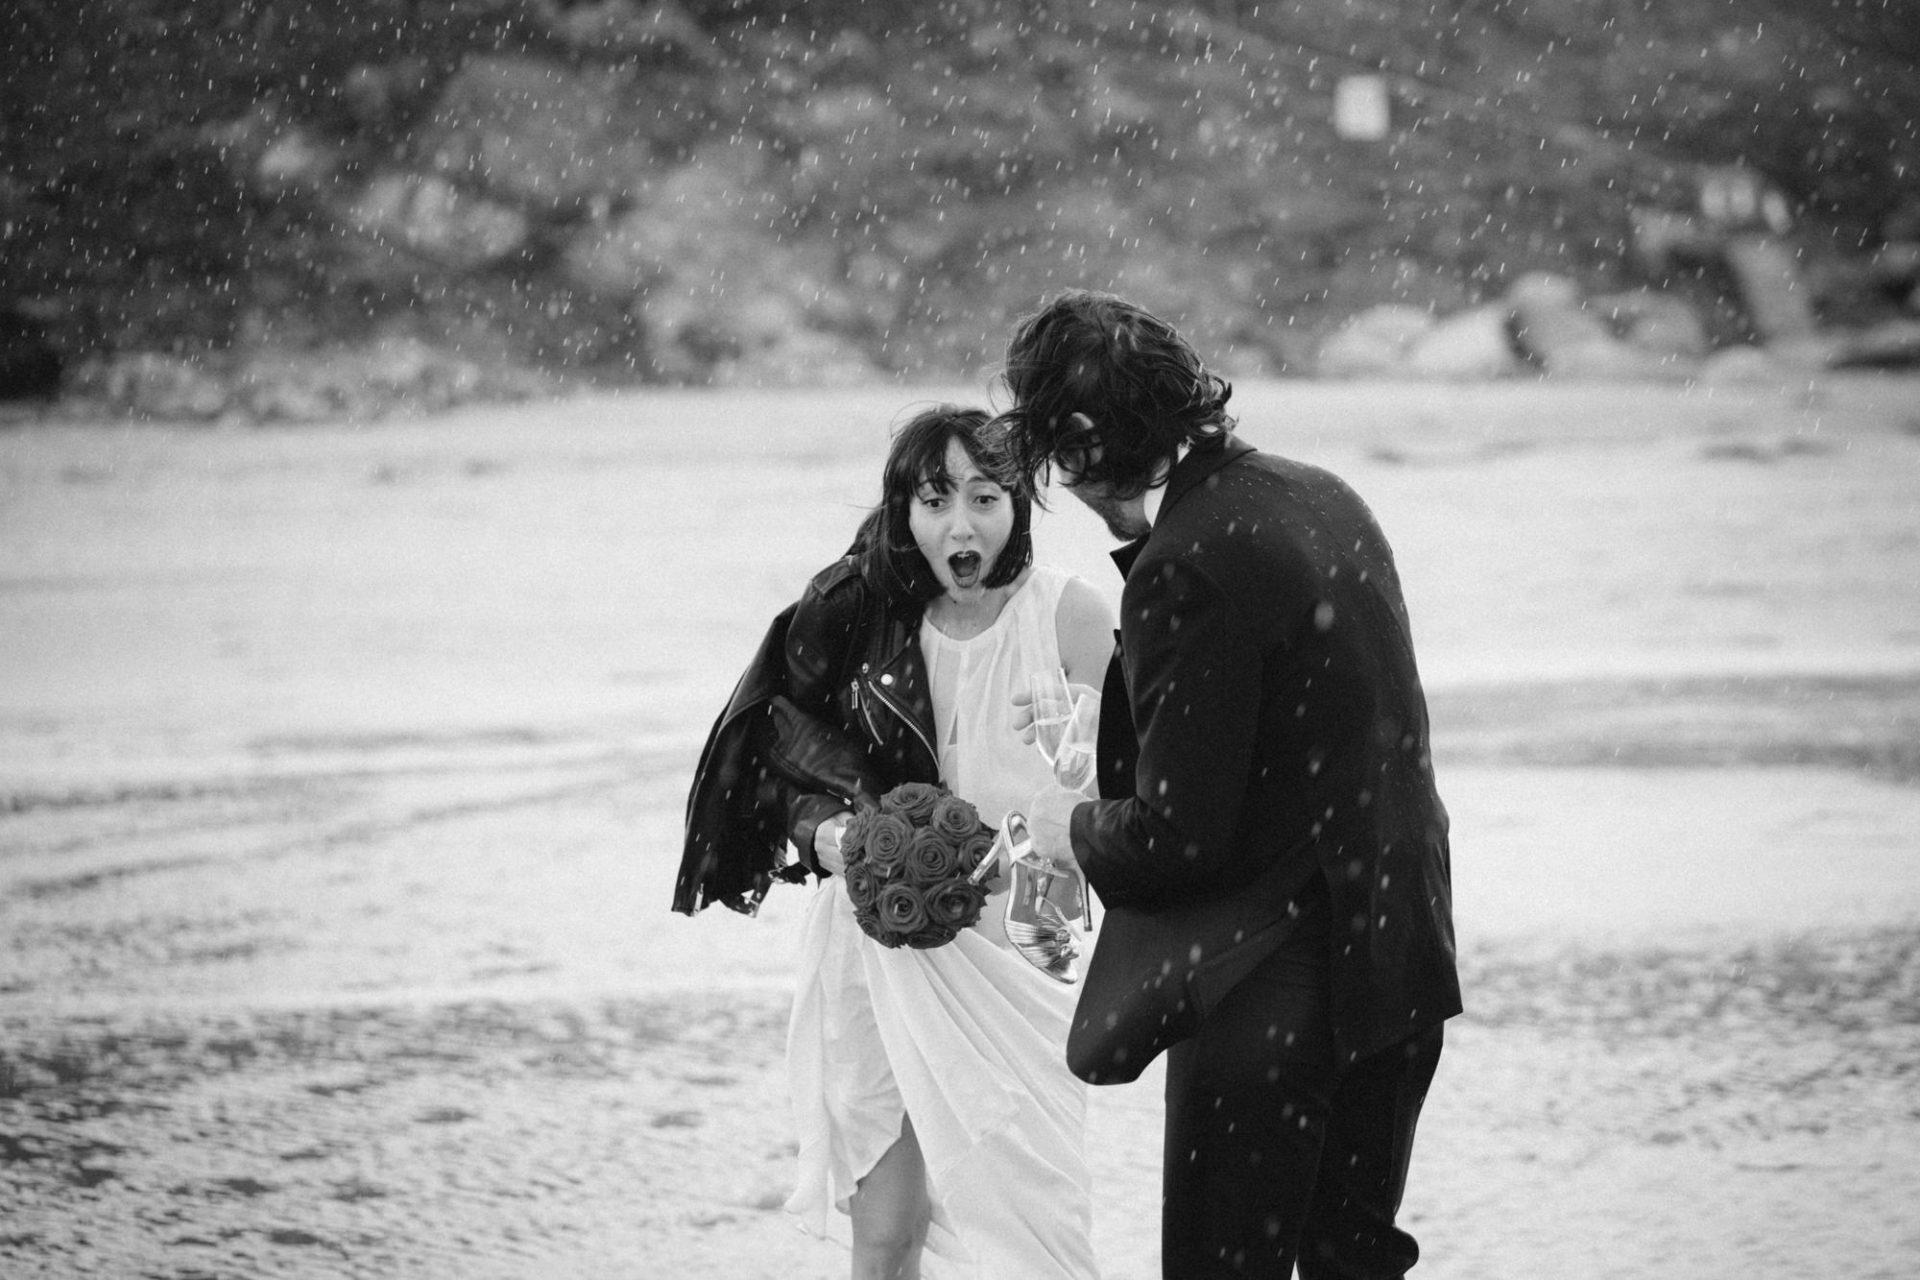 Leo Sharp Wedding Photographer Aude and Ryan The Scarlet Hotel Elopement Wedding Mawgan Porth